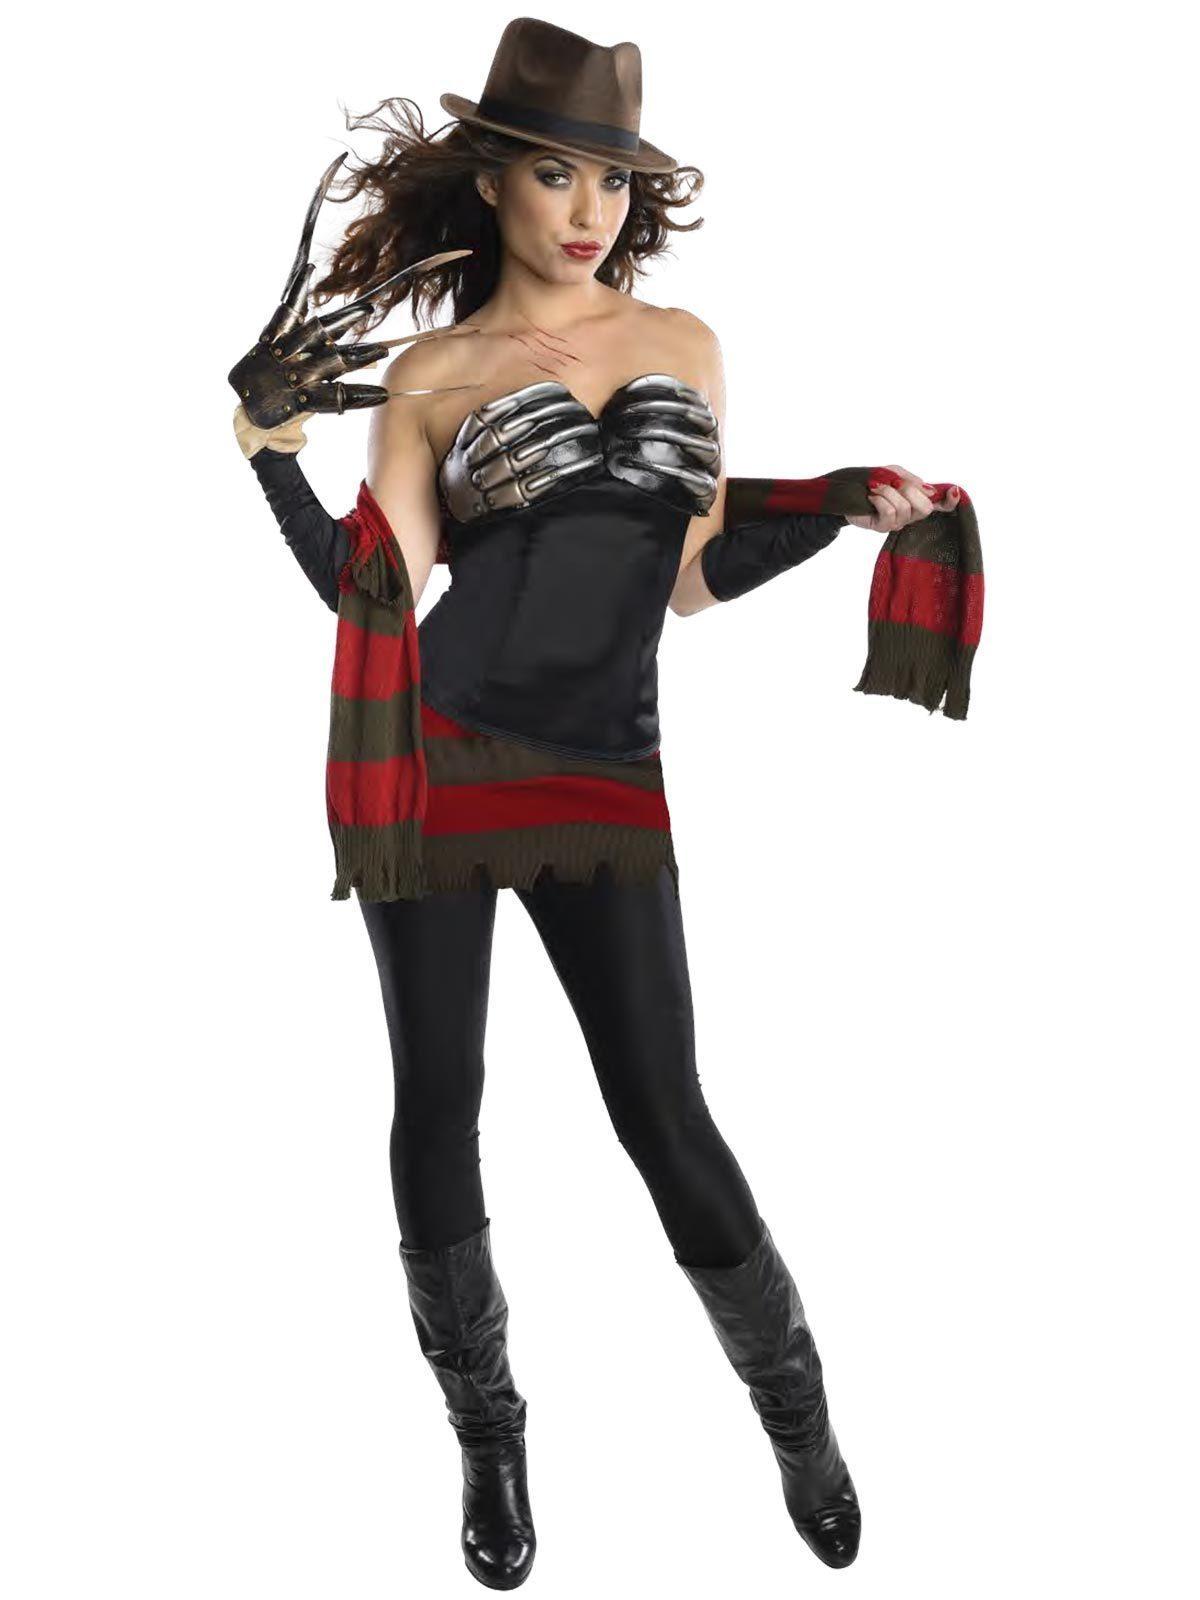 Freddy Krueger 'Never Sleep Again' Costume for Adults - Warner Bros Nightmare on Elm St